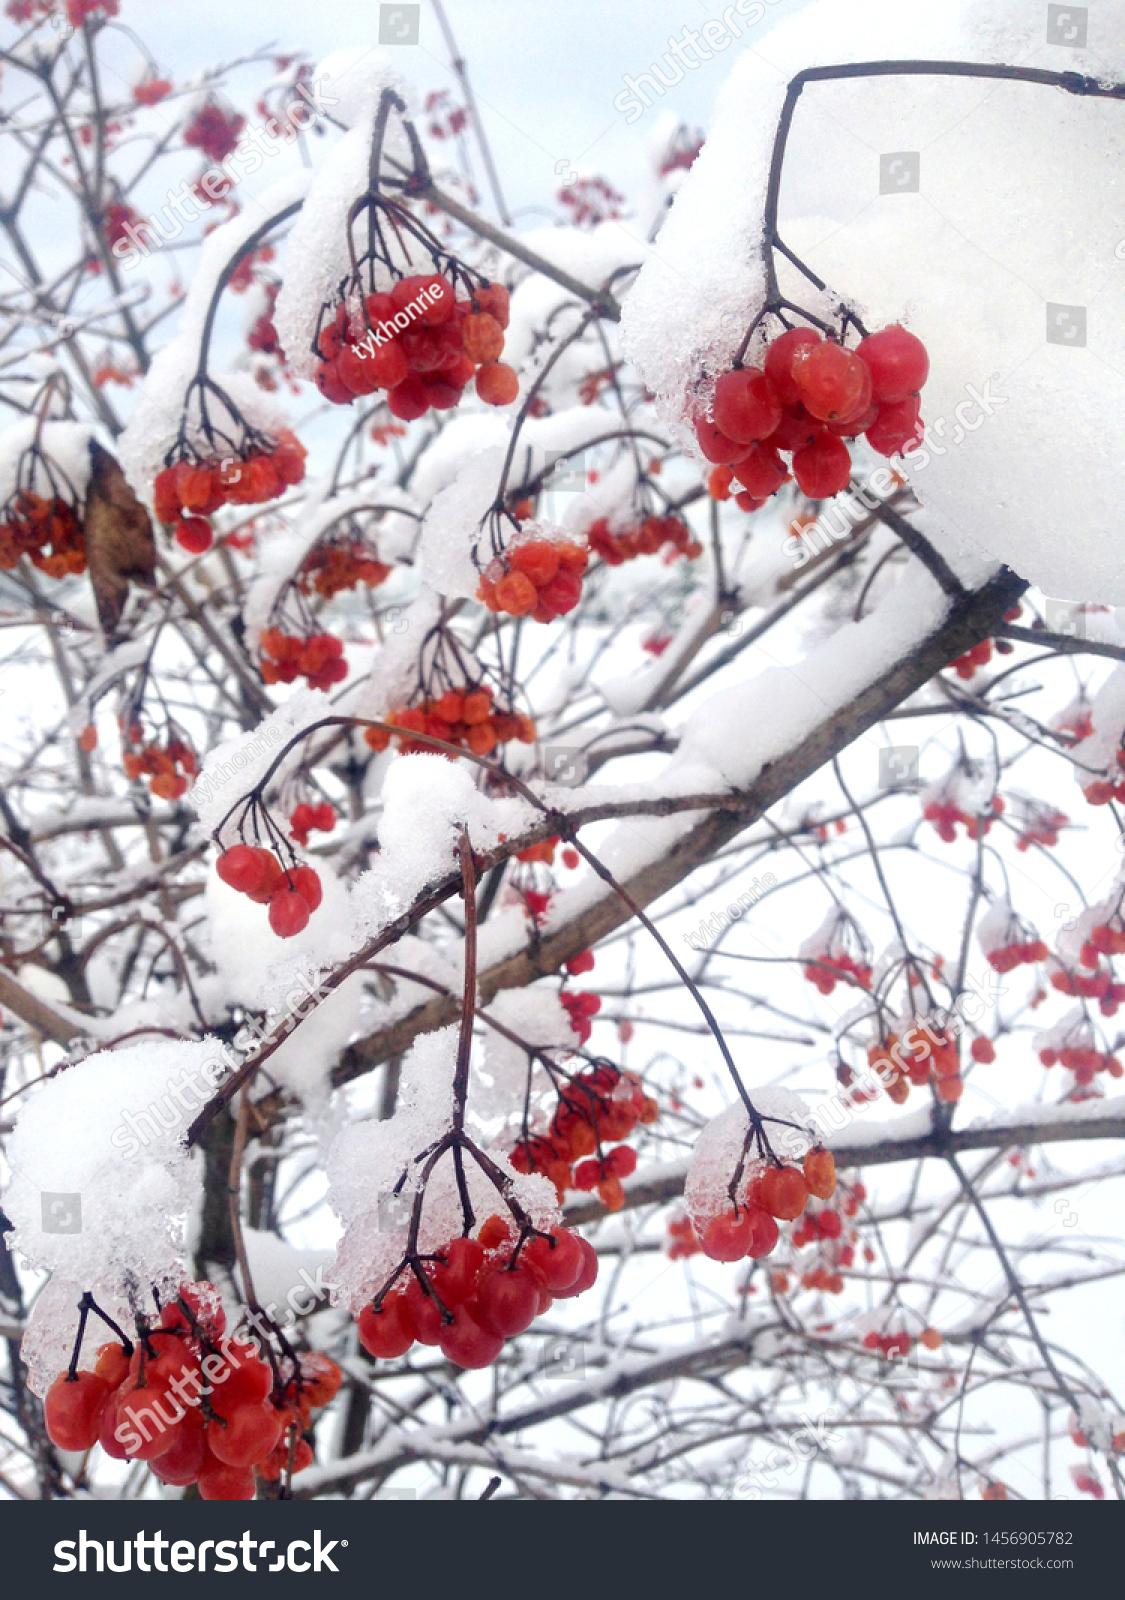 stock-photo-red-viburnum-tree-branches-g